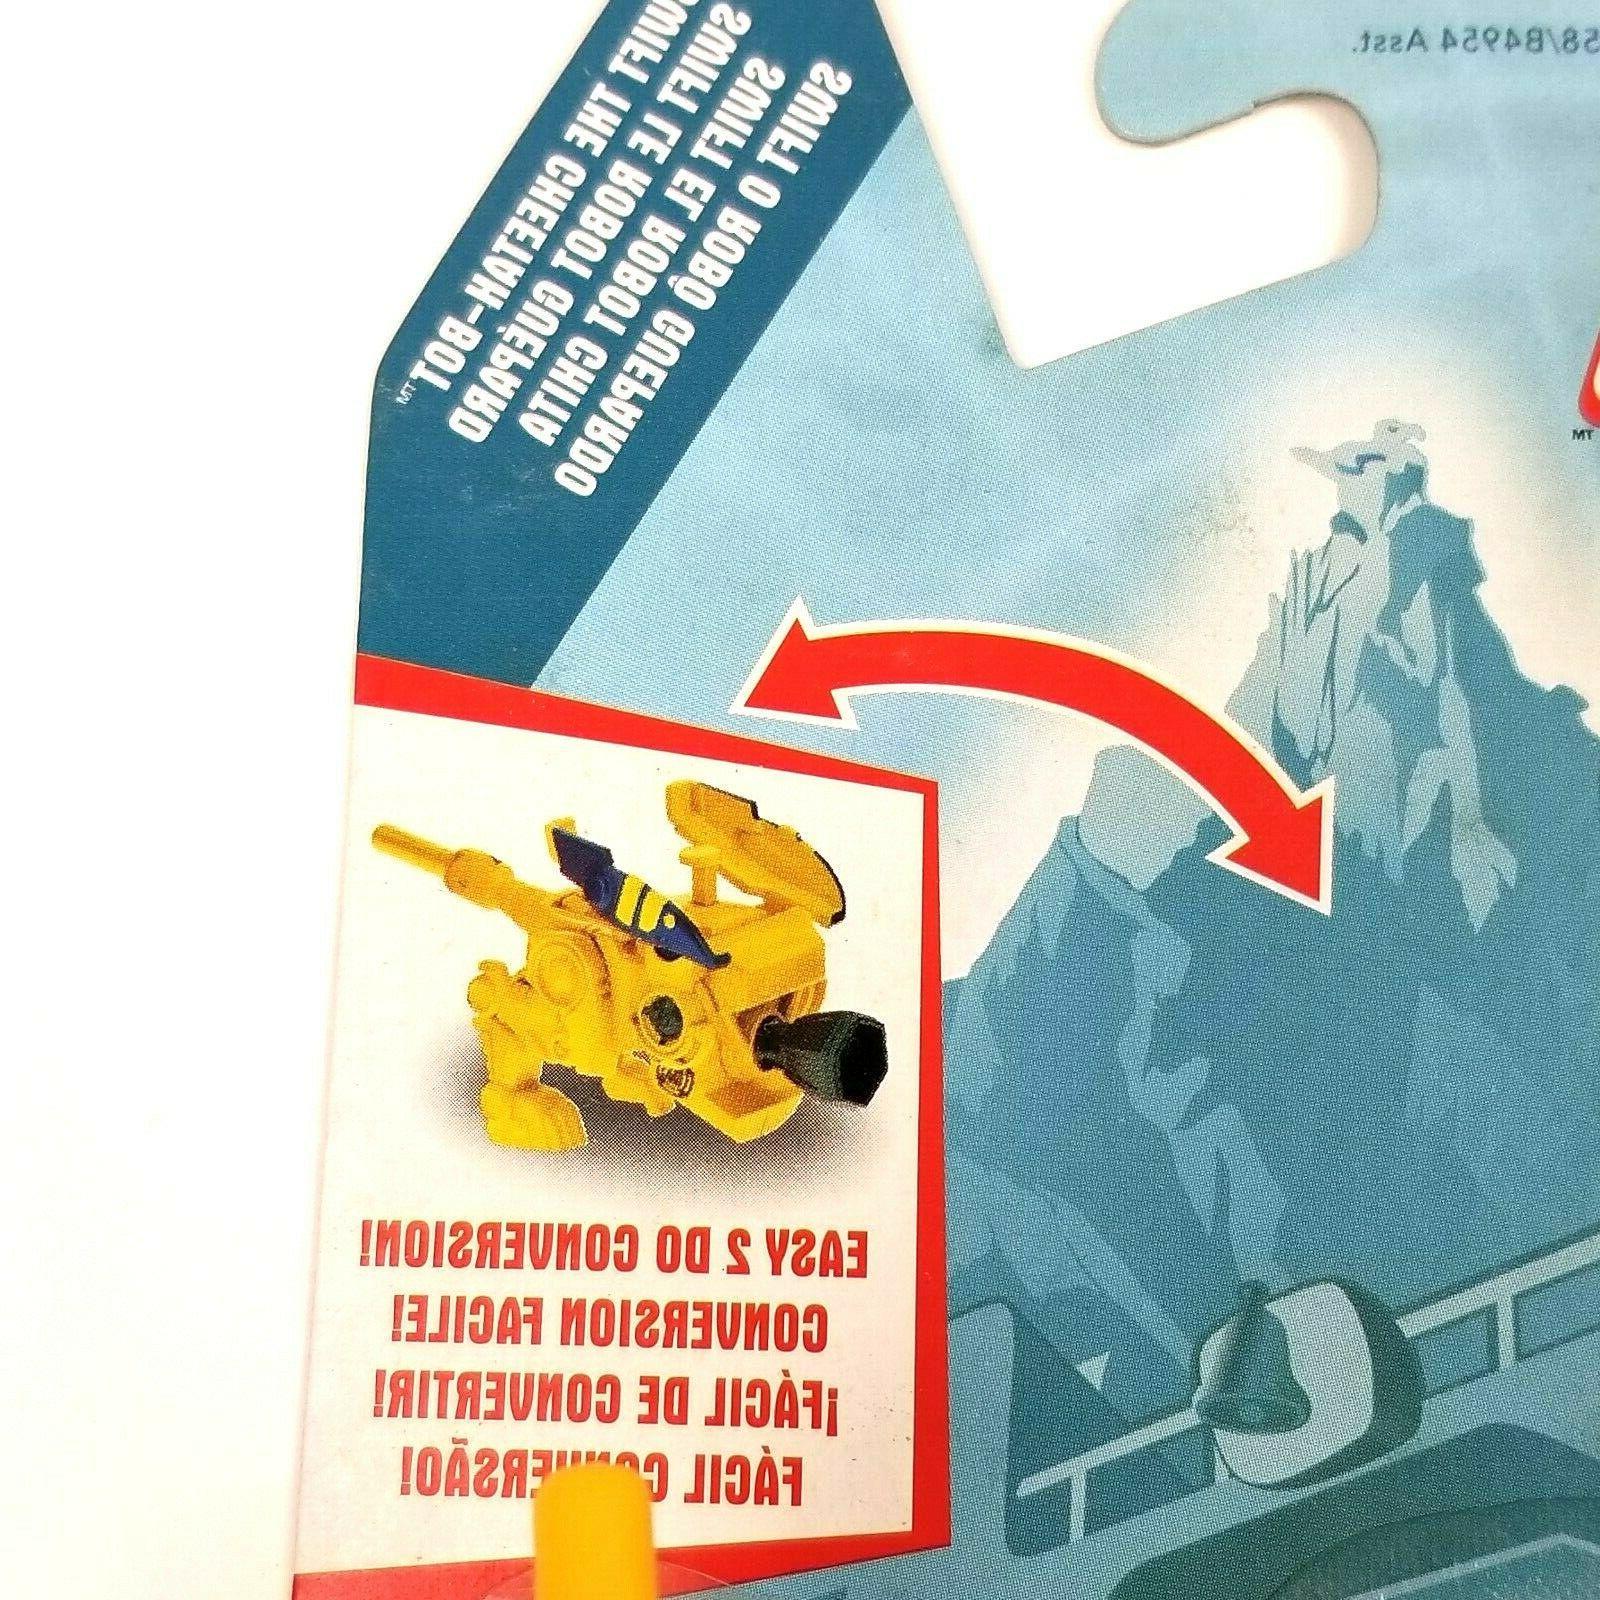 Playskool Heroes Transformers Bots Swift the Cheetah Bot Figure